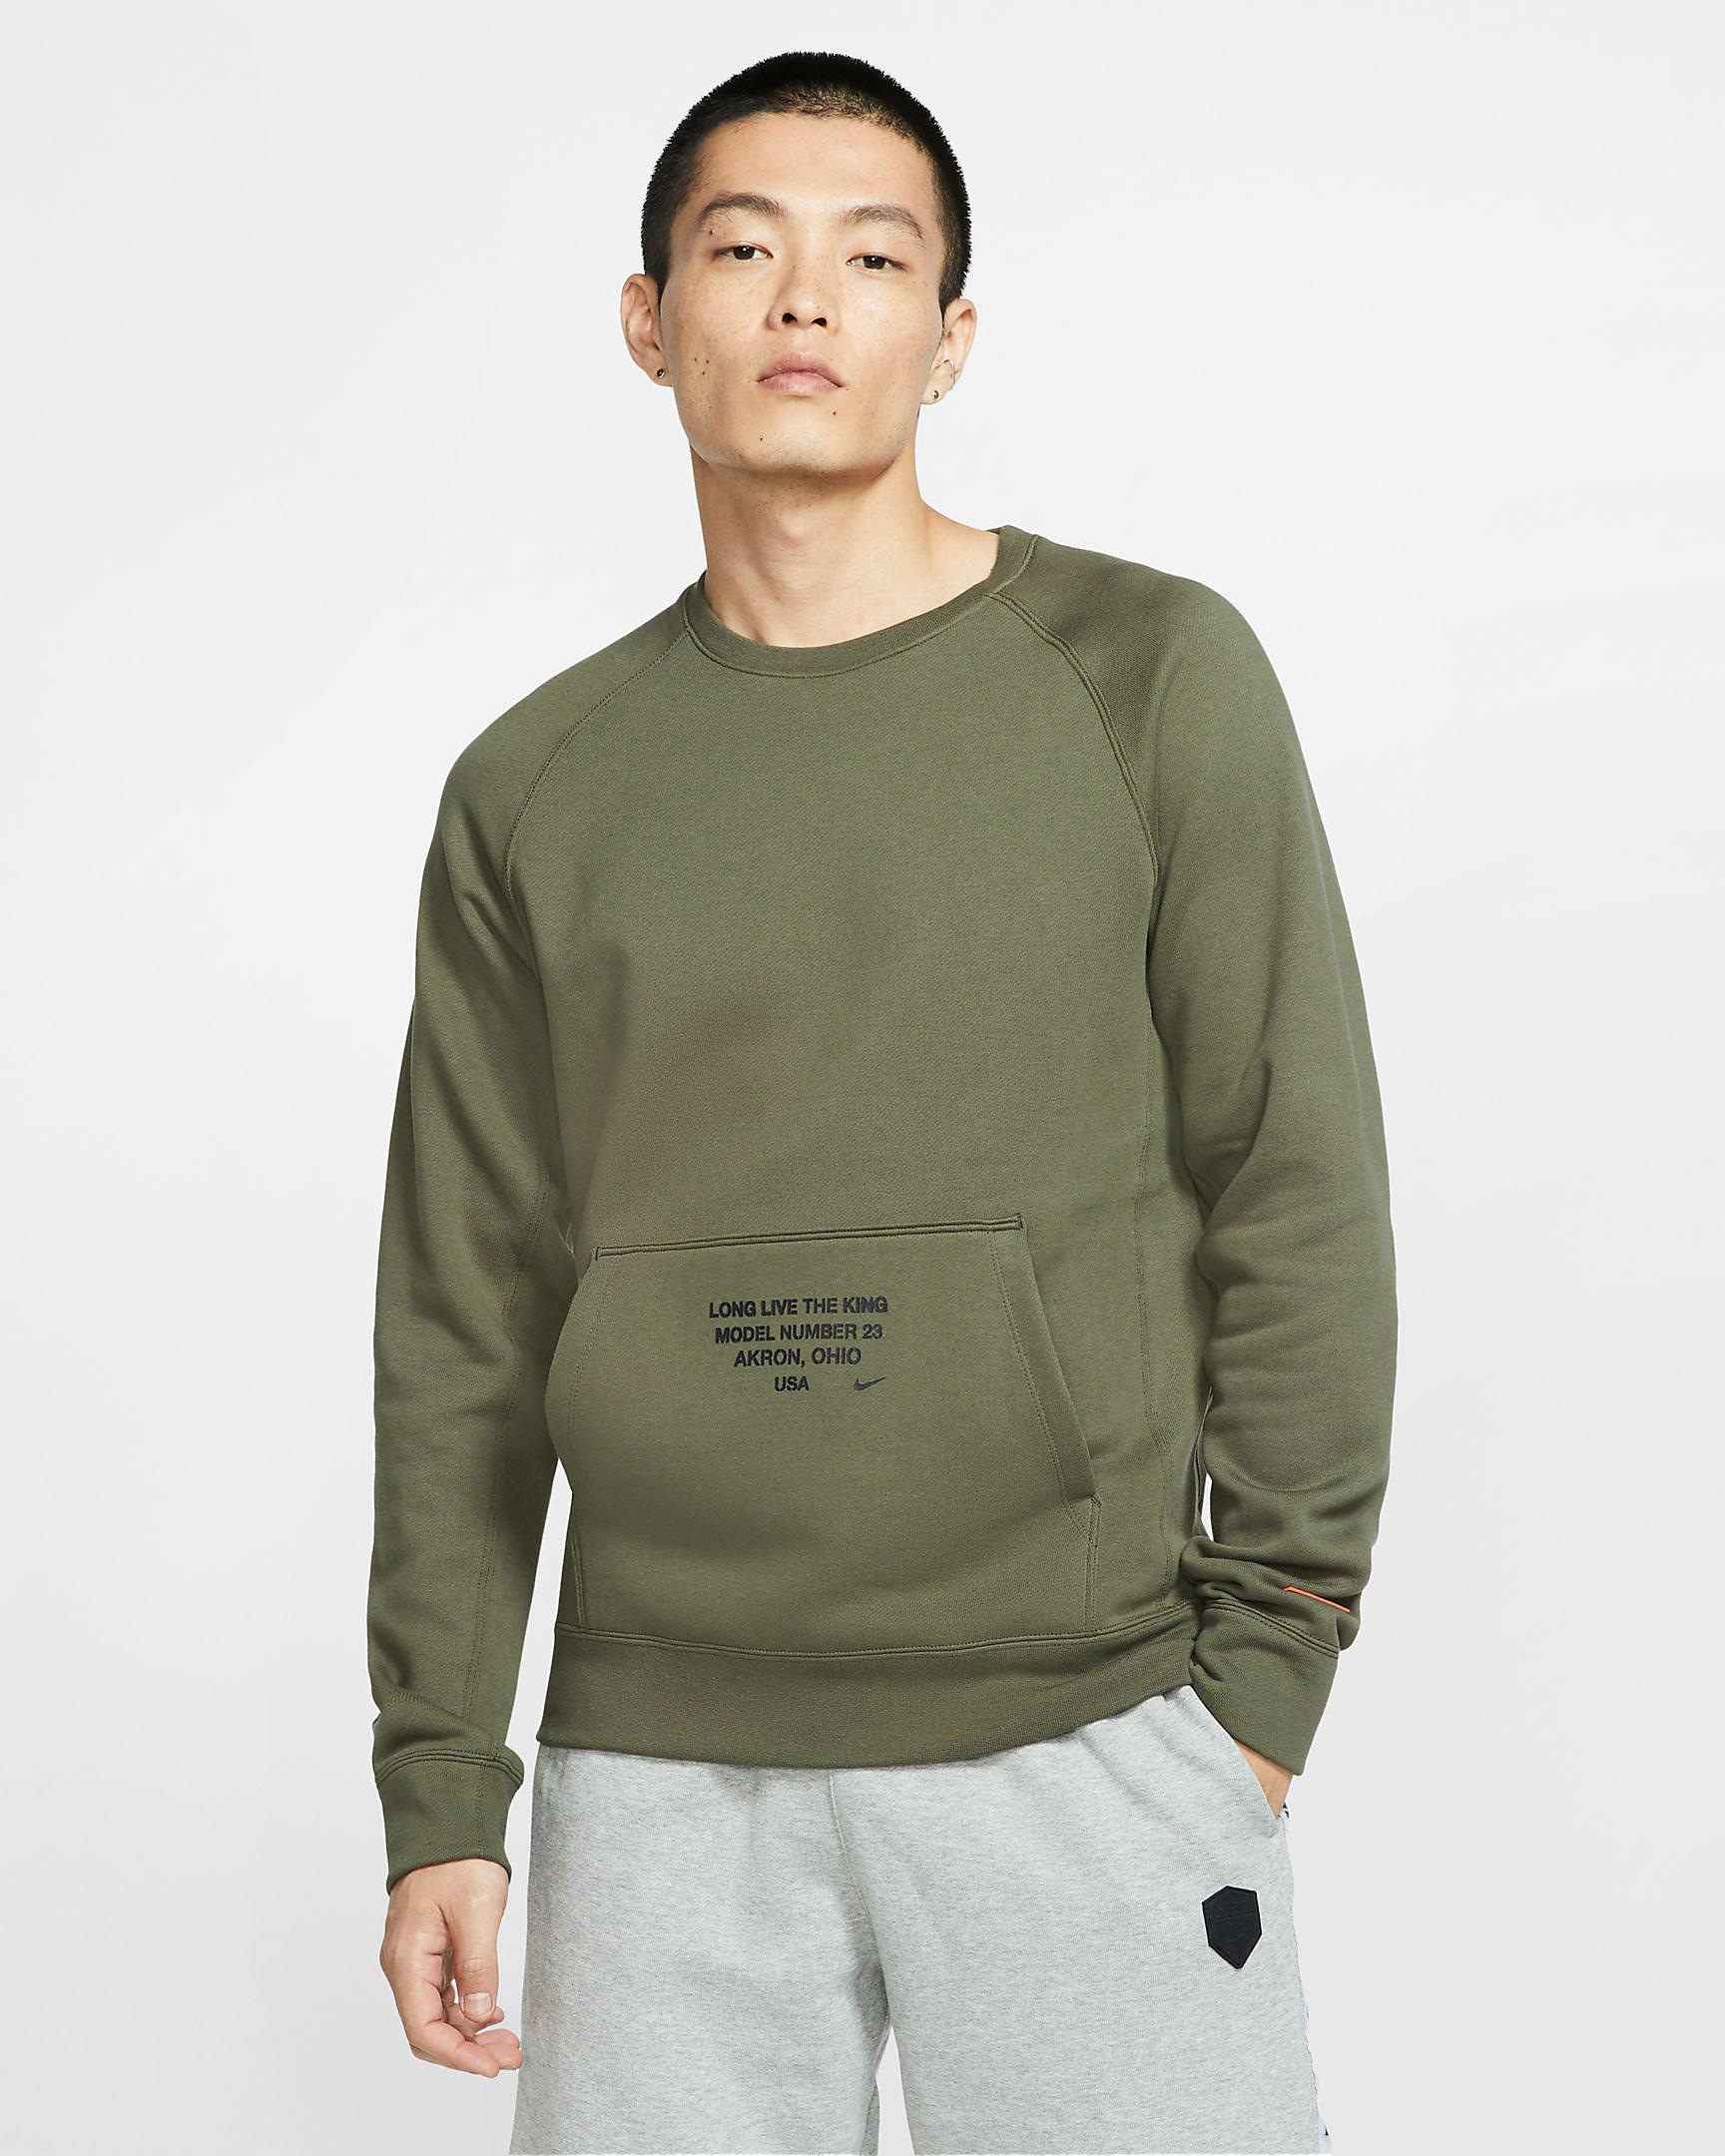 nike-lebron-17-sweatshirt-green-1